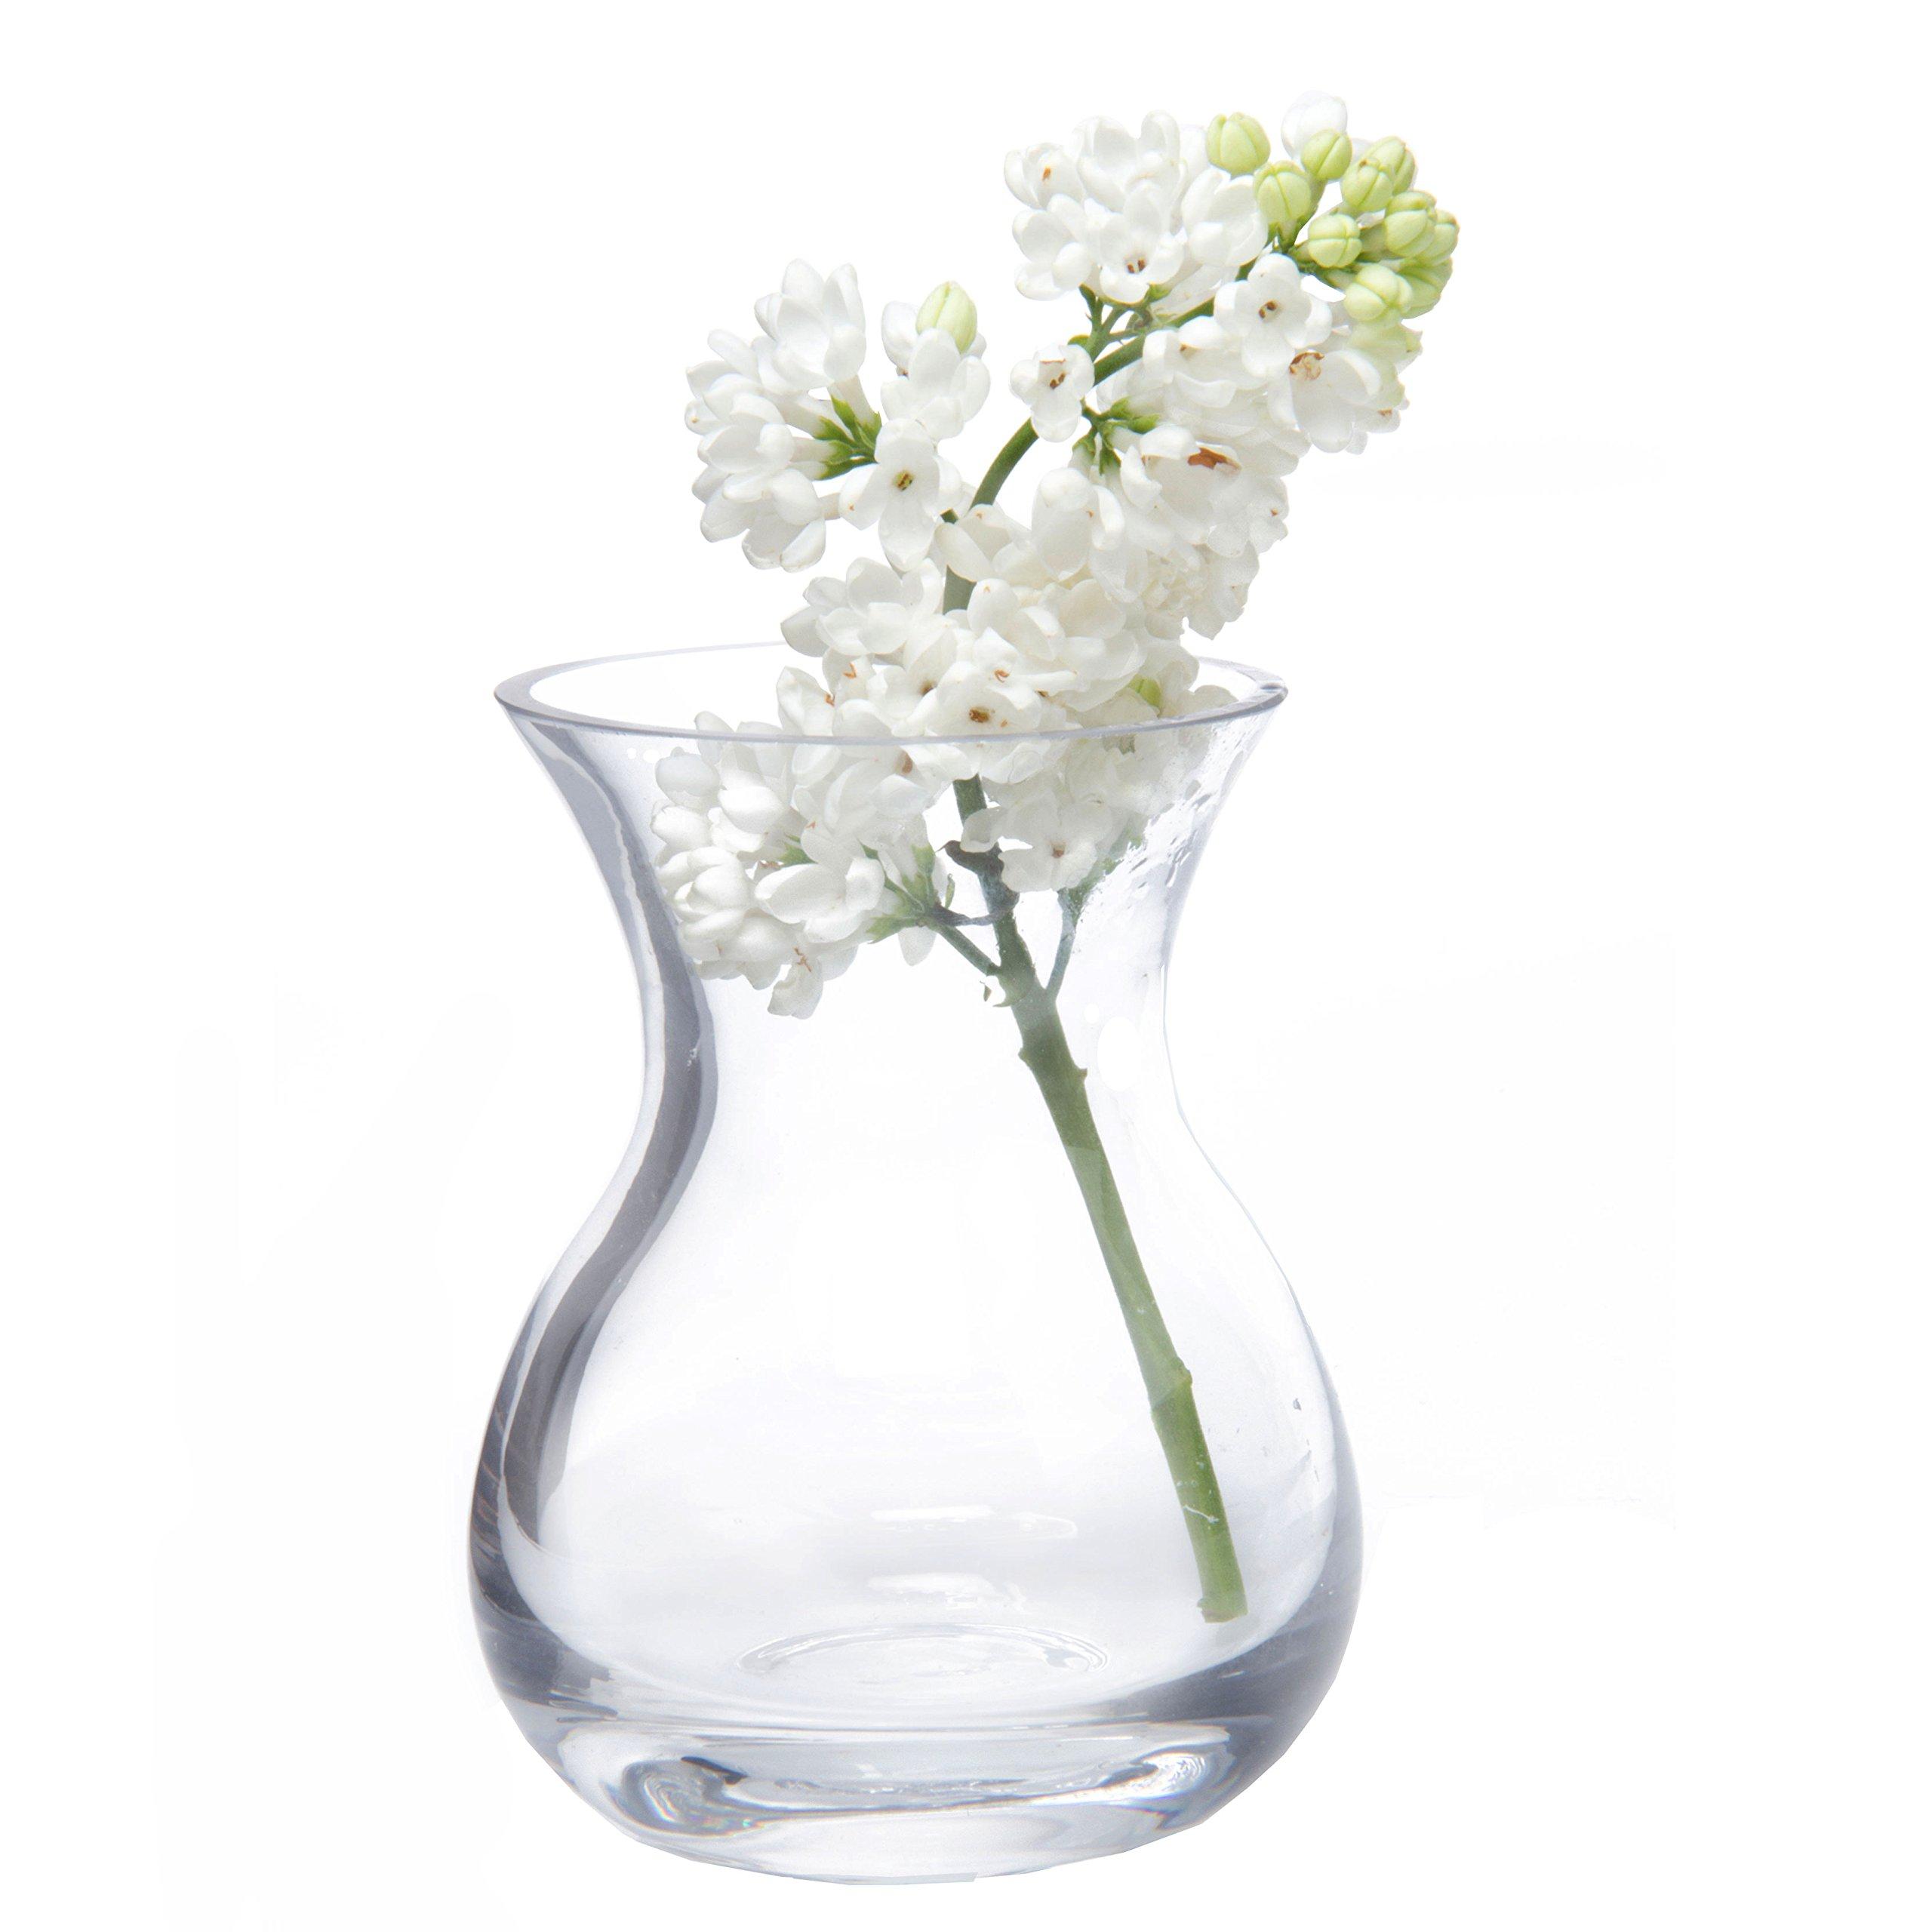 Chive George Shape 4 Unique Clear Glass Flower Vase